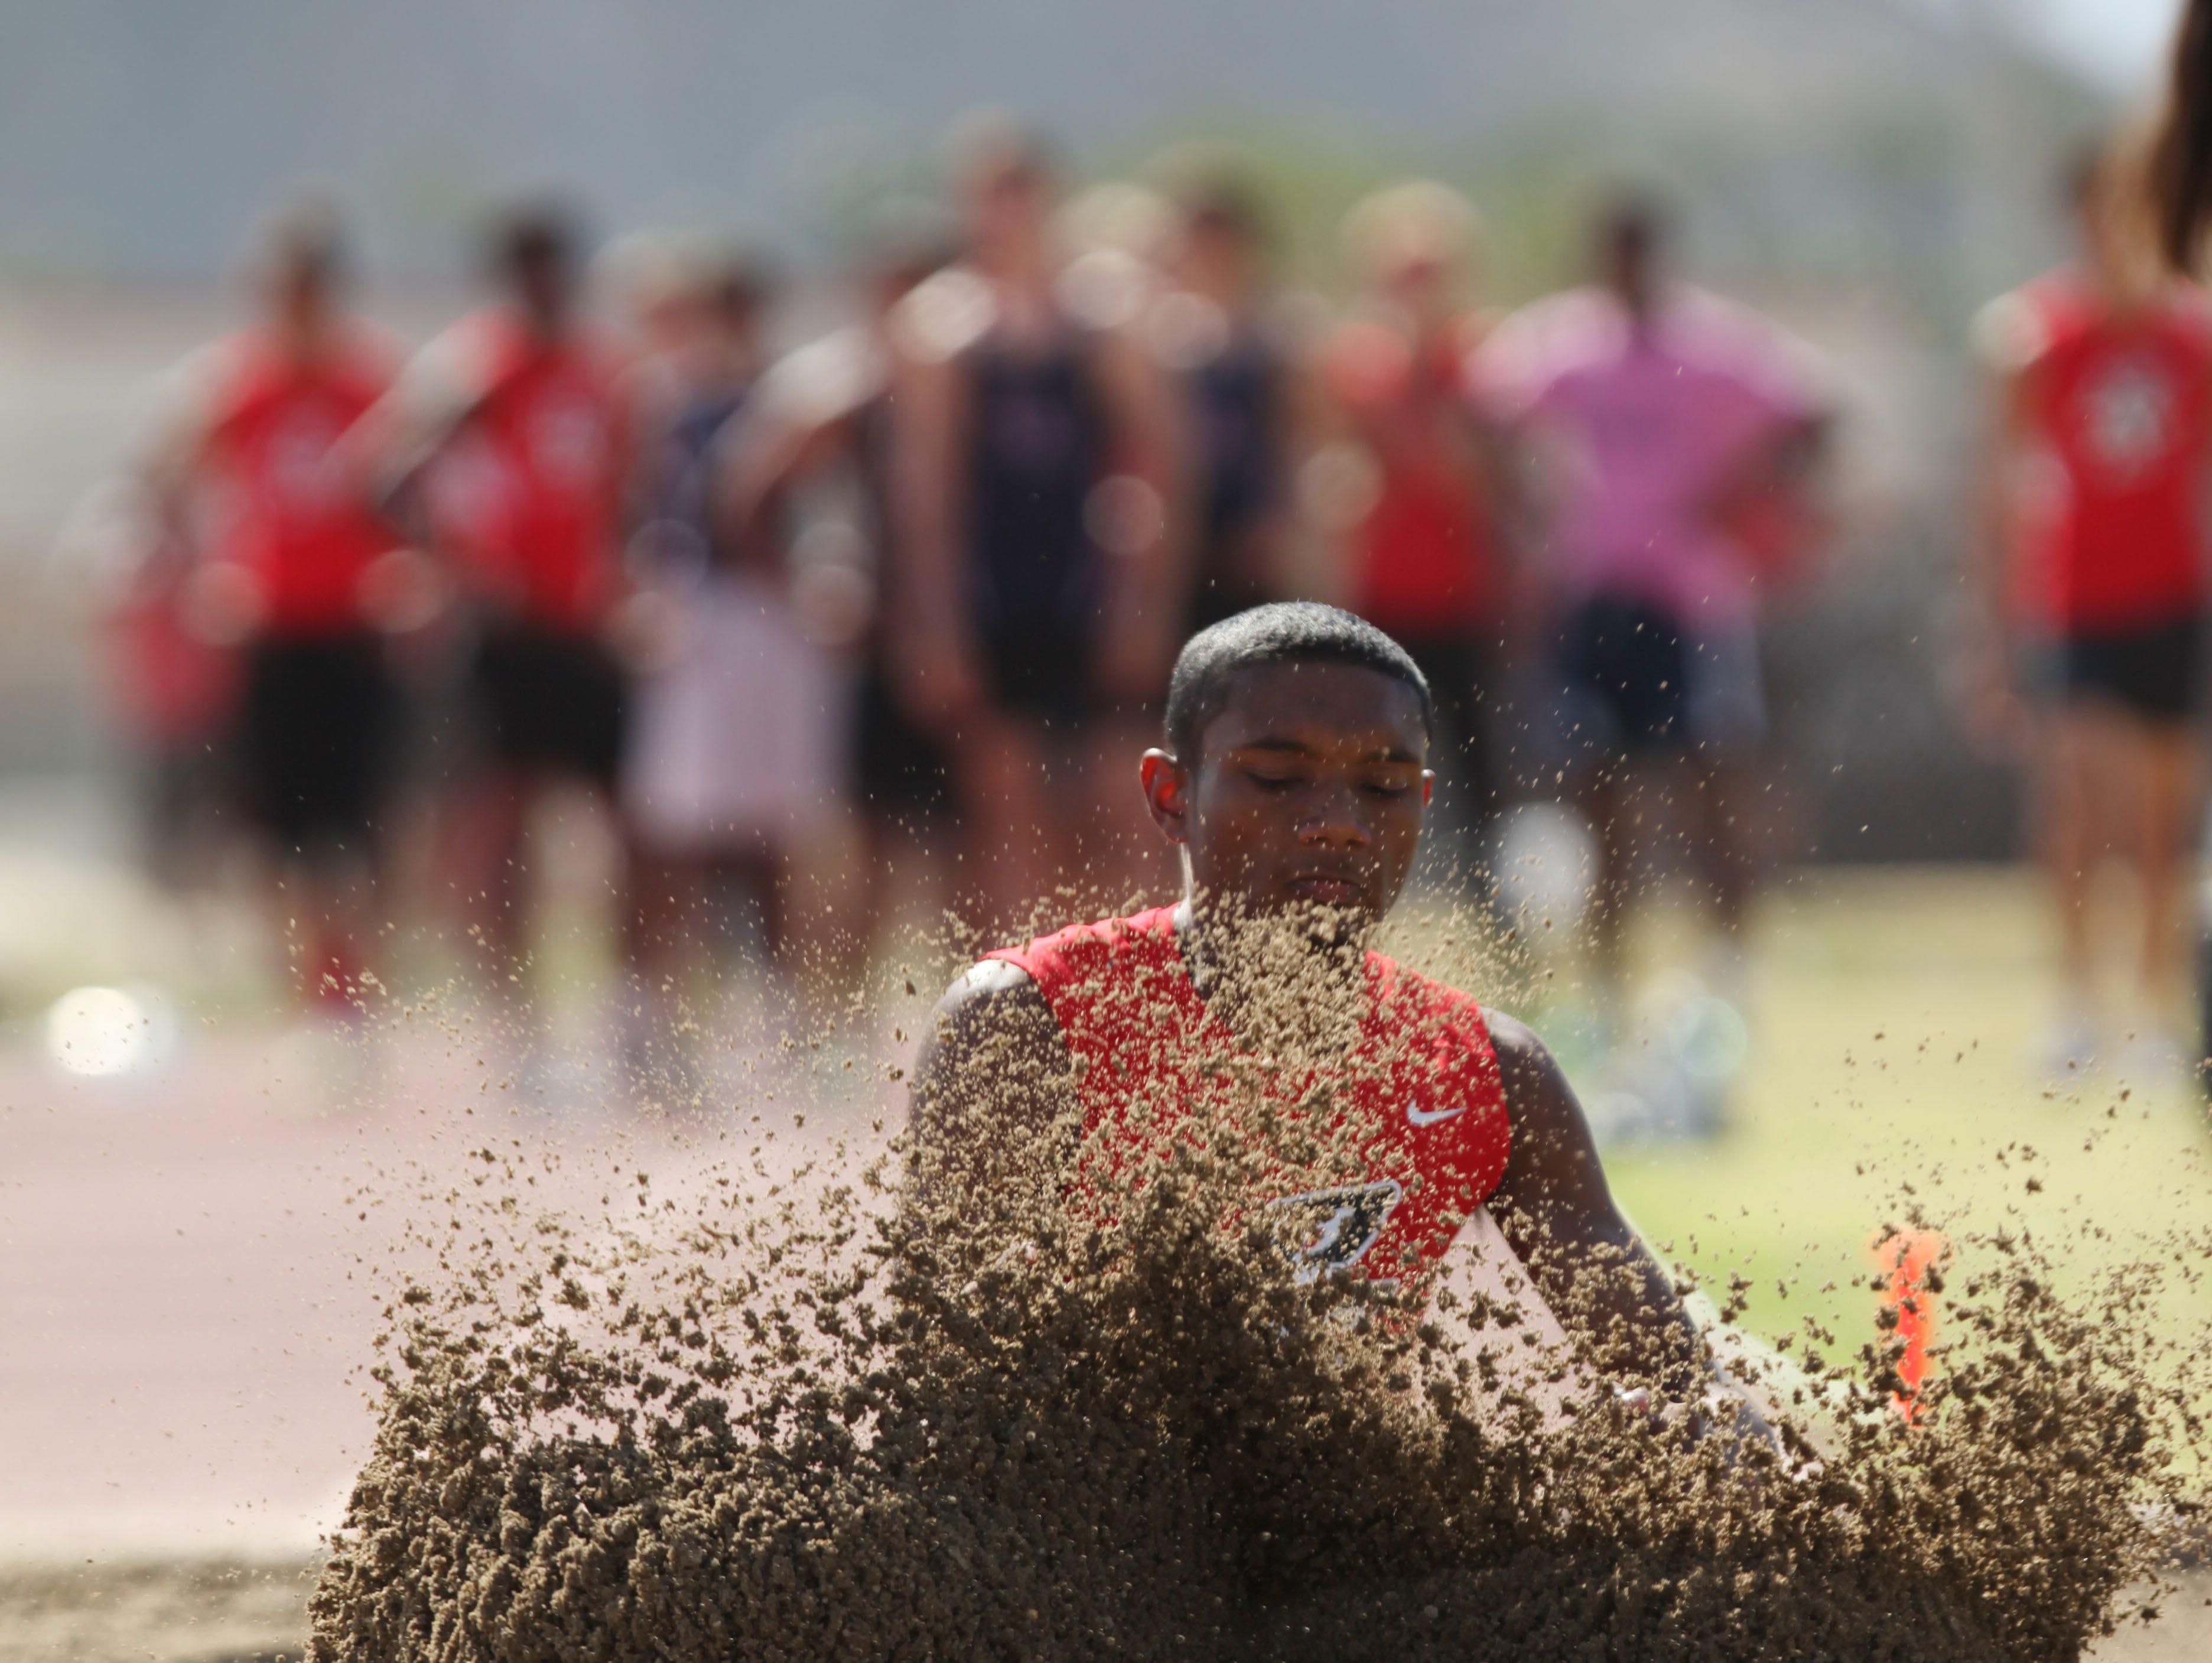 Palm Springs High School's Isaiah Scott does the long jump at La Quinta during his school's meet versus La Quinta High School.